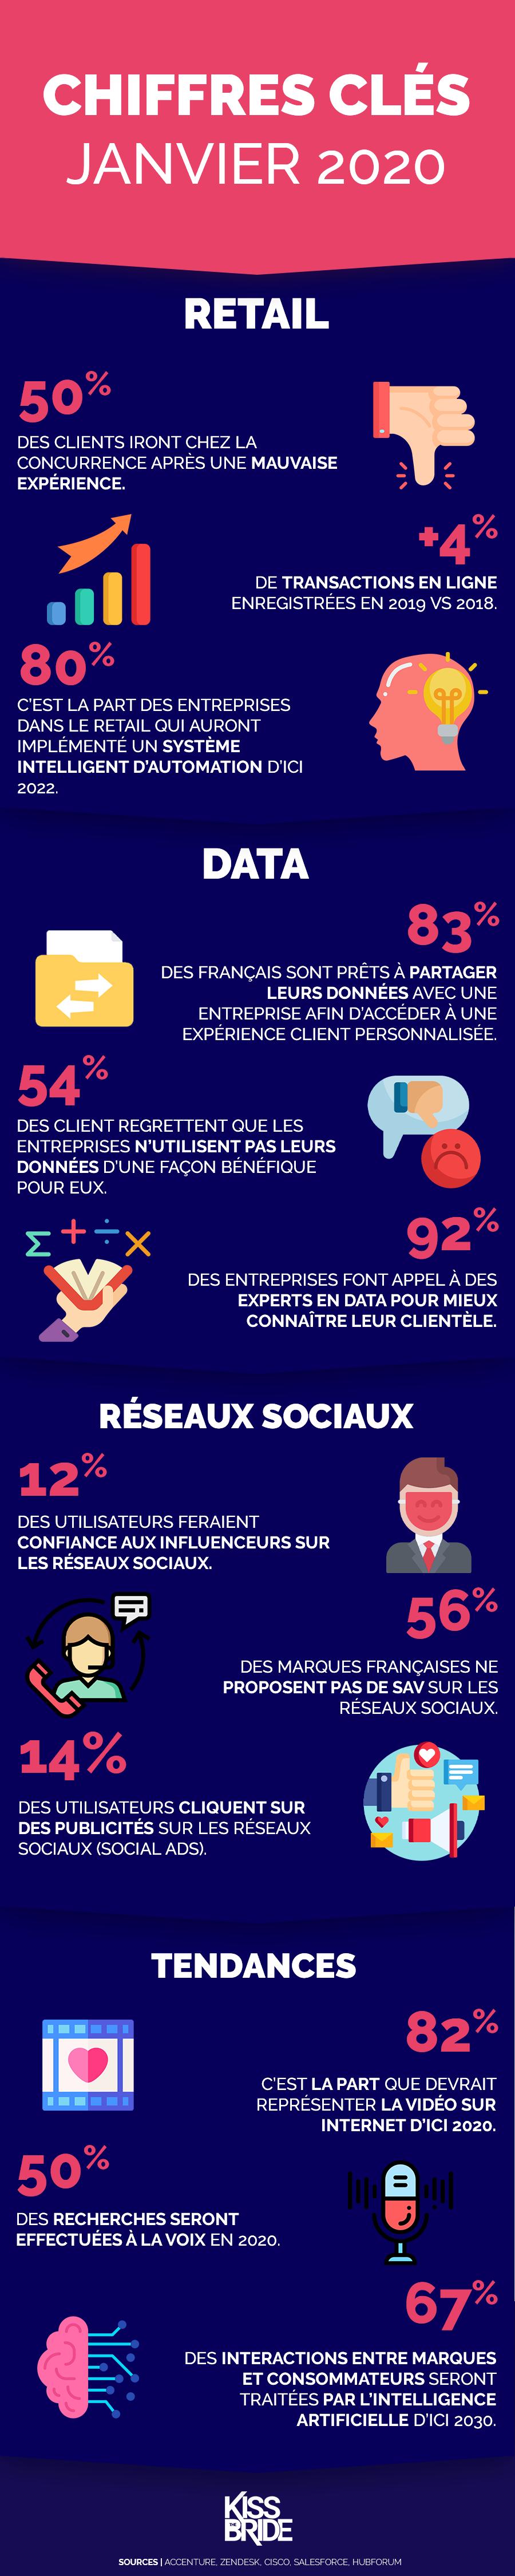 Infographie-chiffres-cles-marketing-janvier-2020